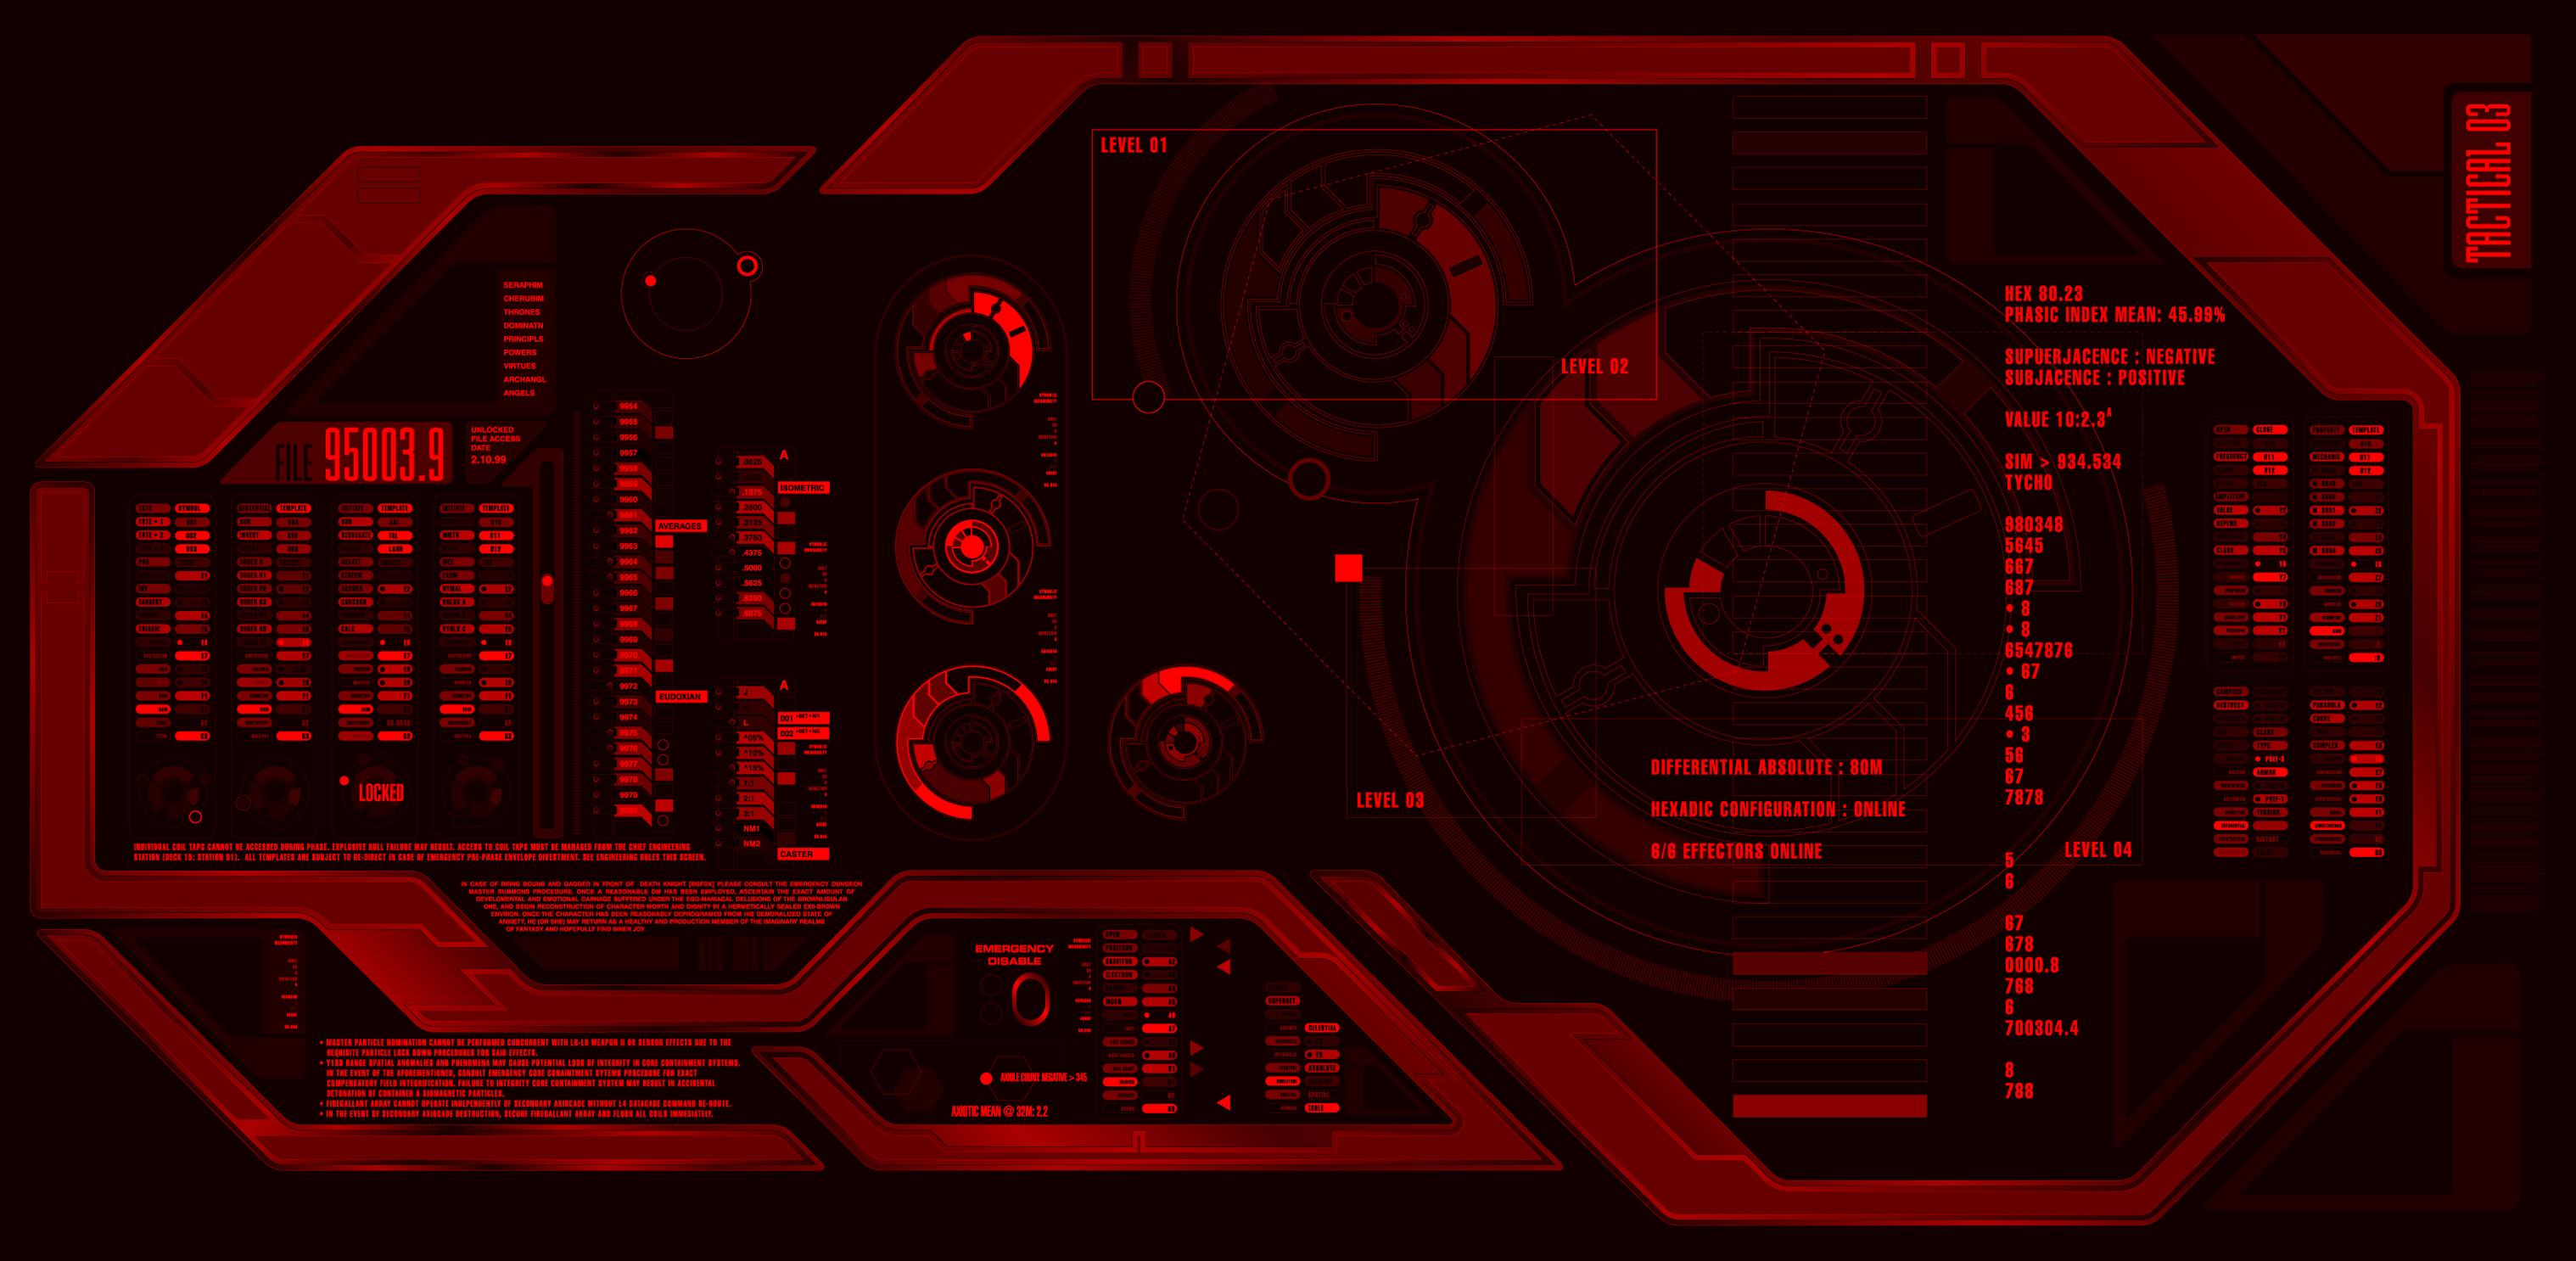 1998 Computer Graphics